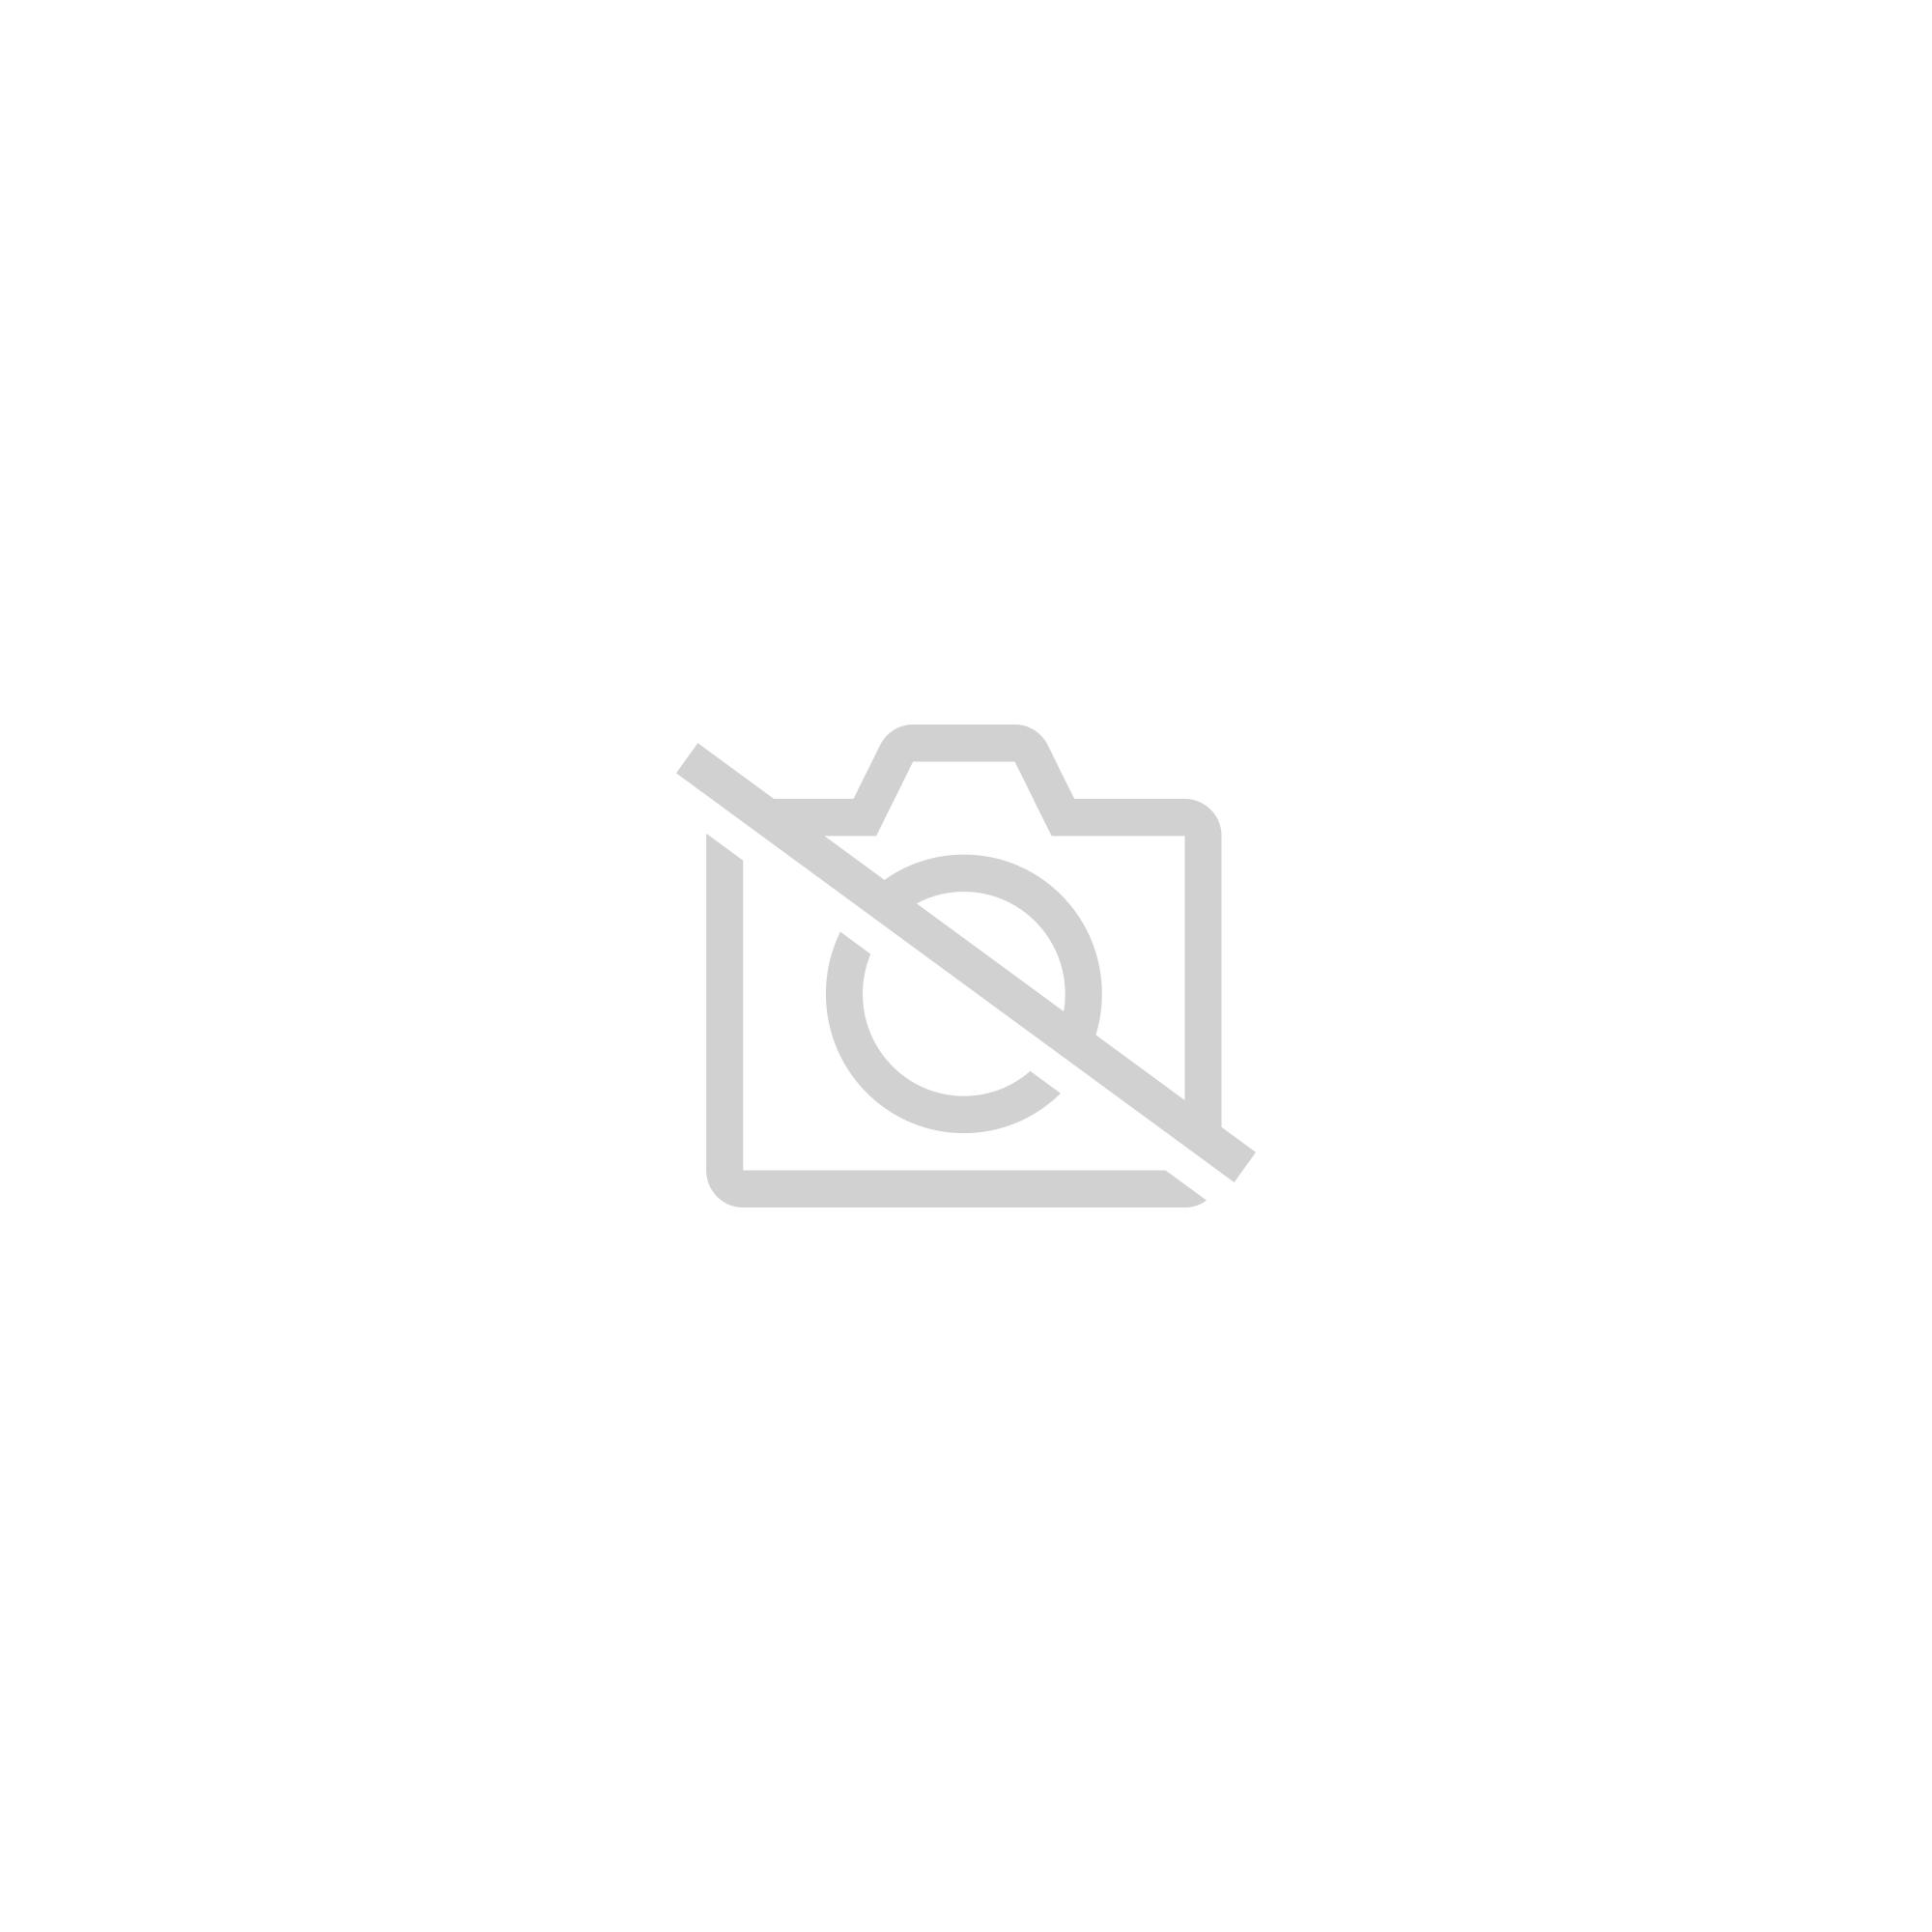 Robinet Tube Tuyau Filtre Reservoir Essence Carburant Interrupteur Switch